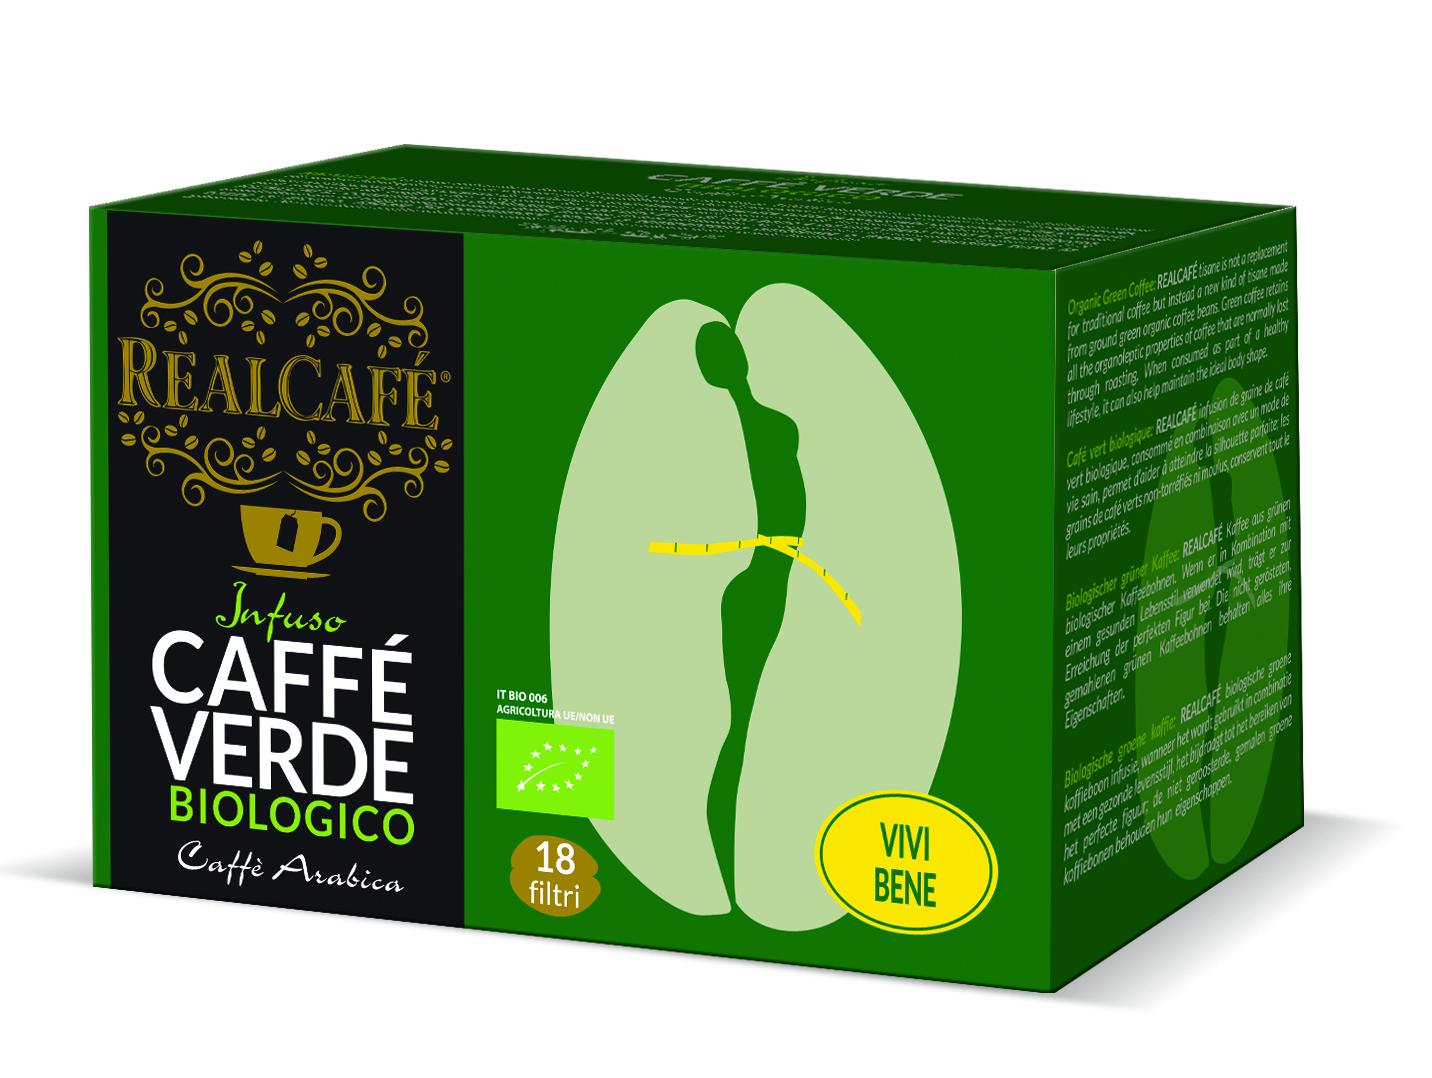 Caffè Verde Biologico